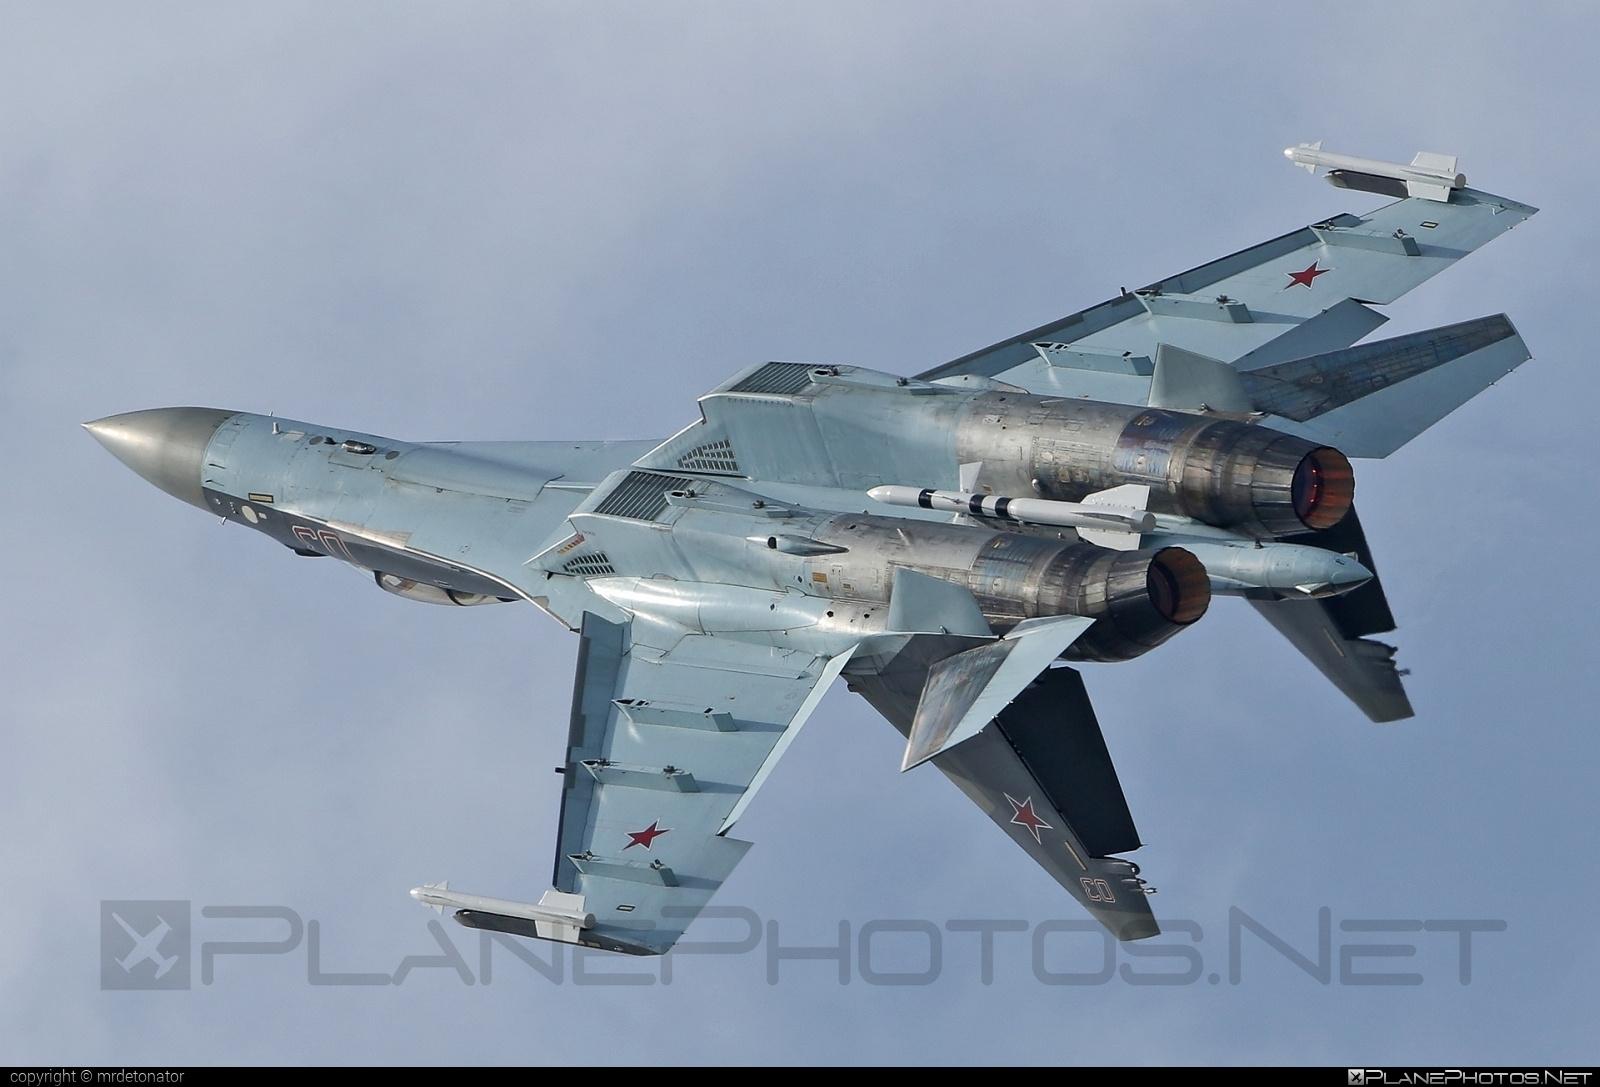 Sukhoi Su-35S - 03 operated by Voyenno-vozdushnye sily Rossii (Russian Air Force) #su35 #su35s #sukhoi #sukhoi35 #sukhoisu35s